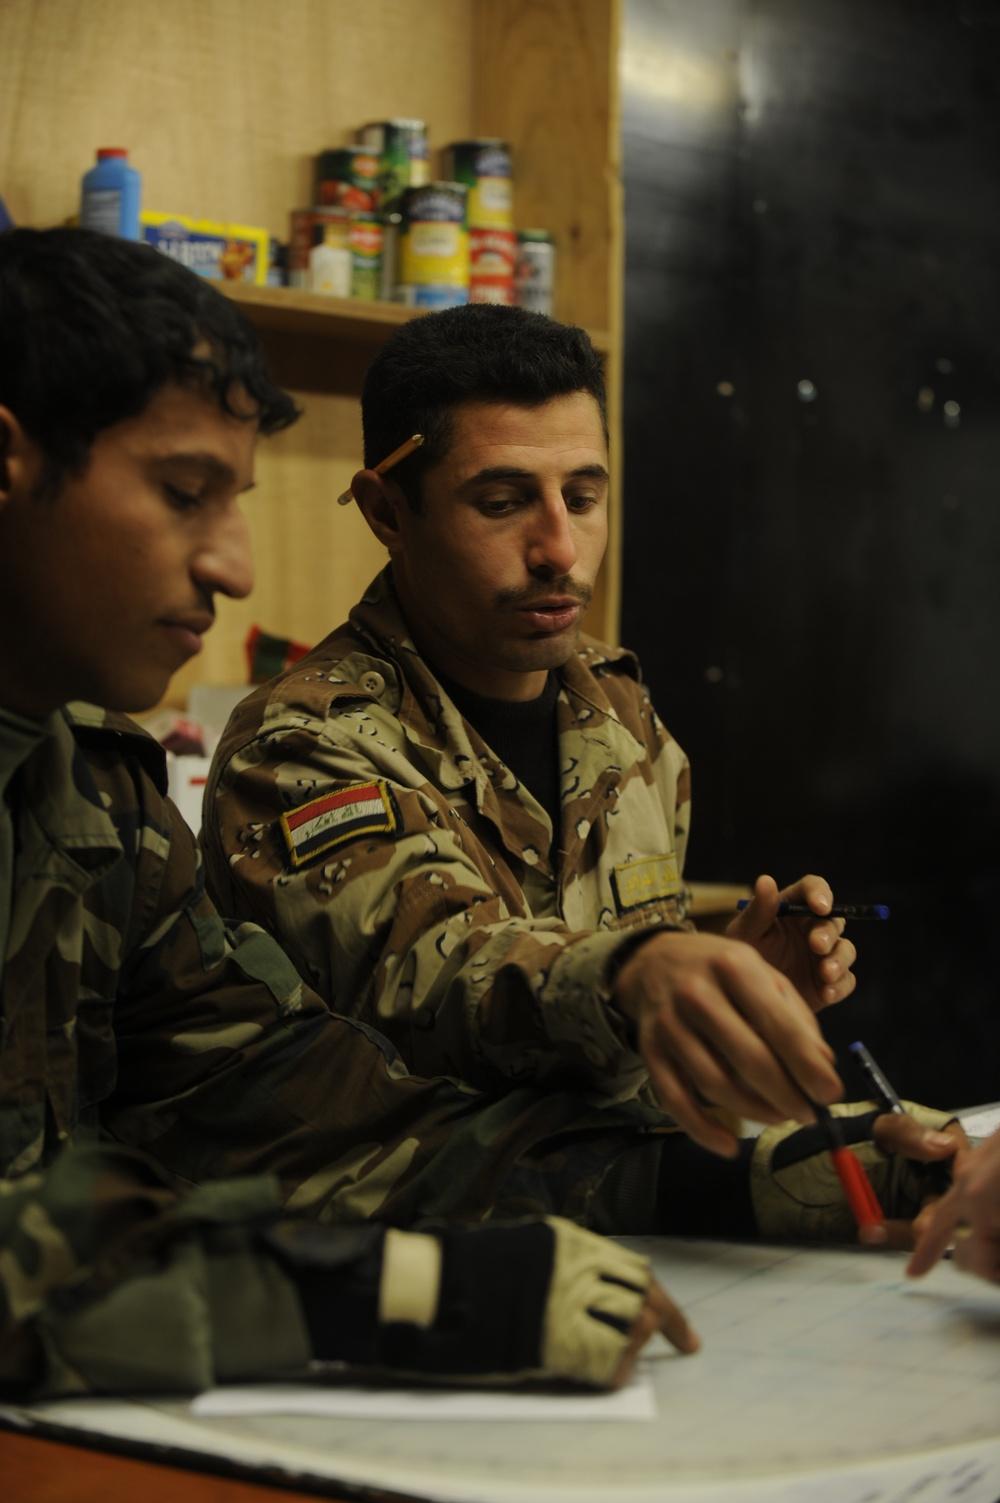 Iraqi soldiers take mortars course at Forward Operating Base Echo